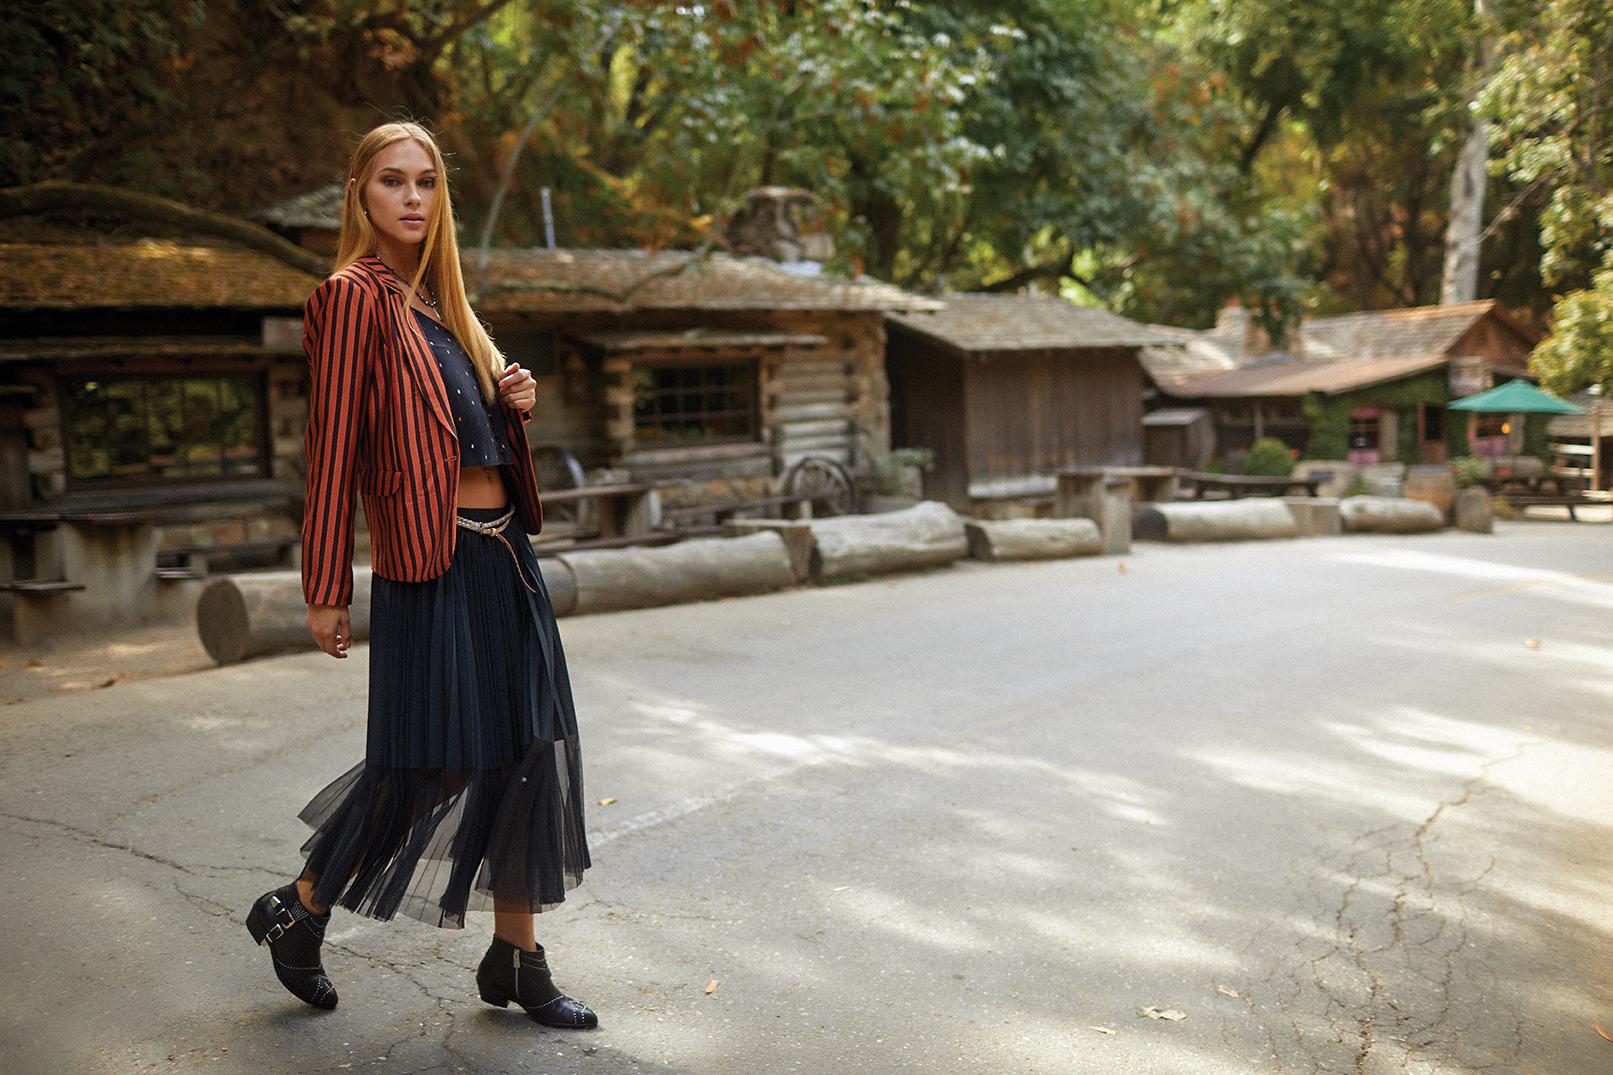 Jacket, AMBIANCE. Skirt, ANTOINETTE. Camisole, ROWAN. Boots, JAKE & JONES. Belt and black pearl necklace, WILDFLOWER WOMEN.